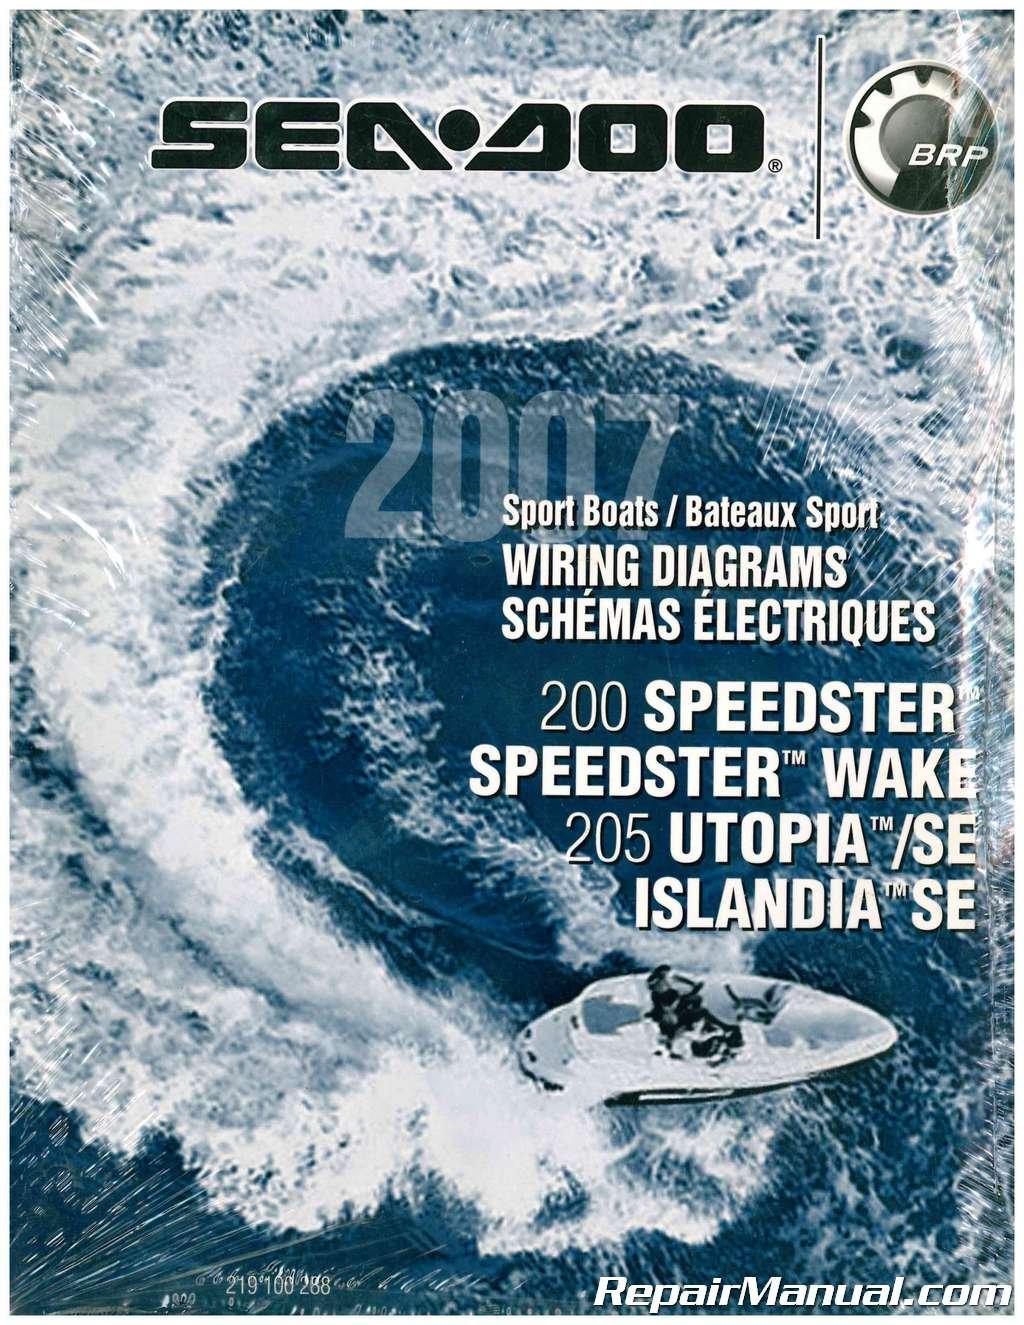 219100288 2007 sea-doo boat wiring diagram 200 speedster speedster ... 2004 sea doo sportster wiring diagram  amazon.com